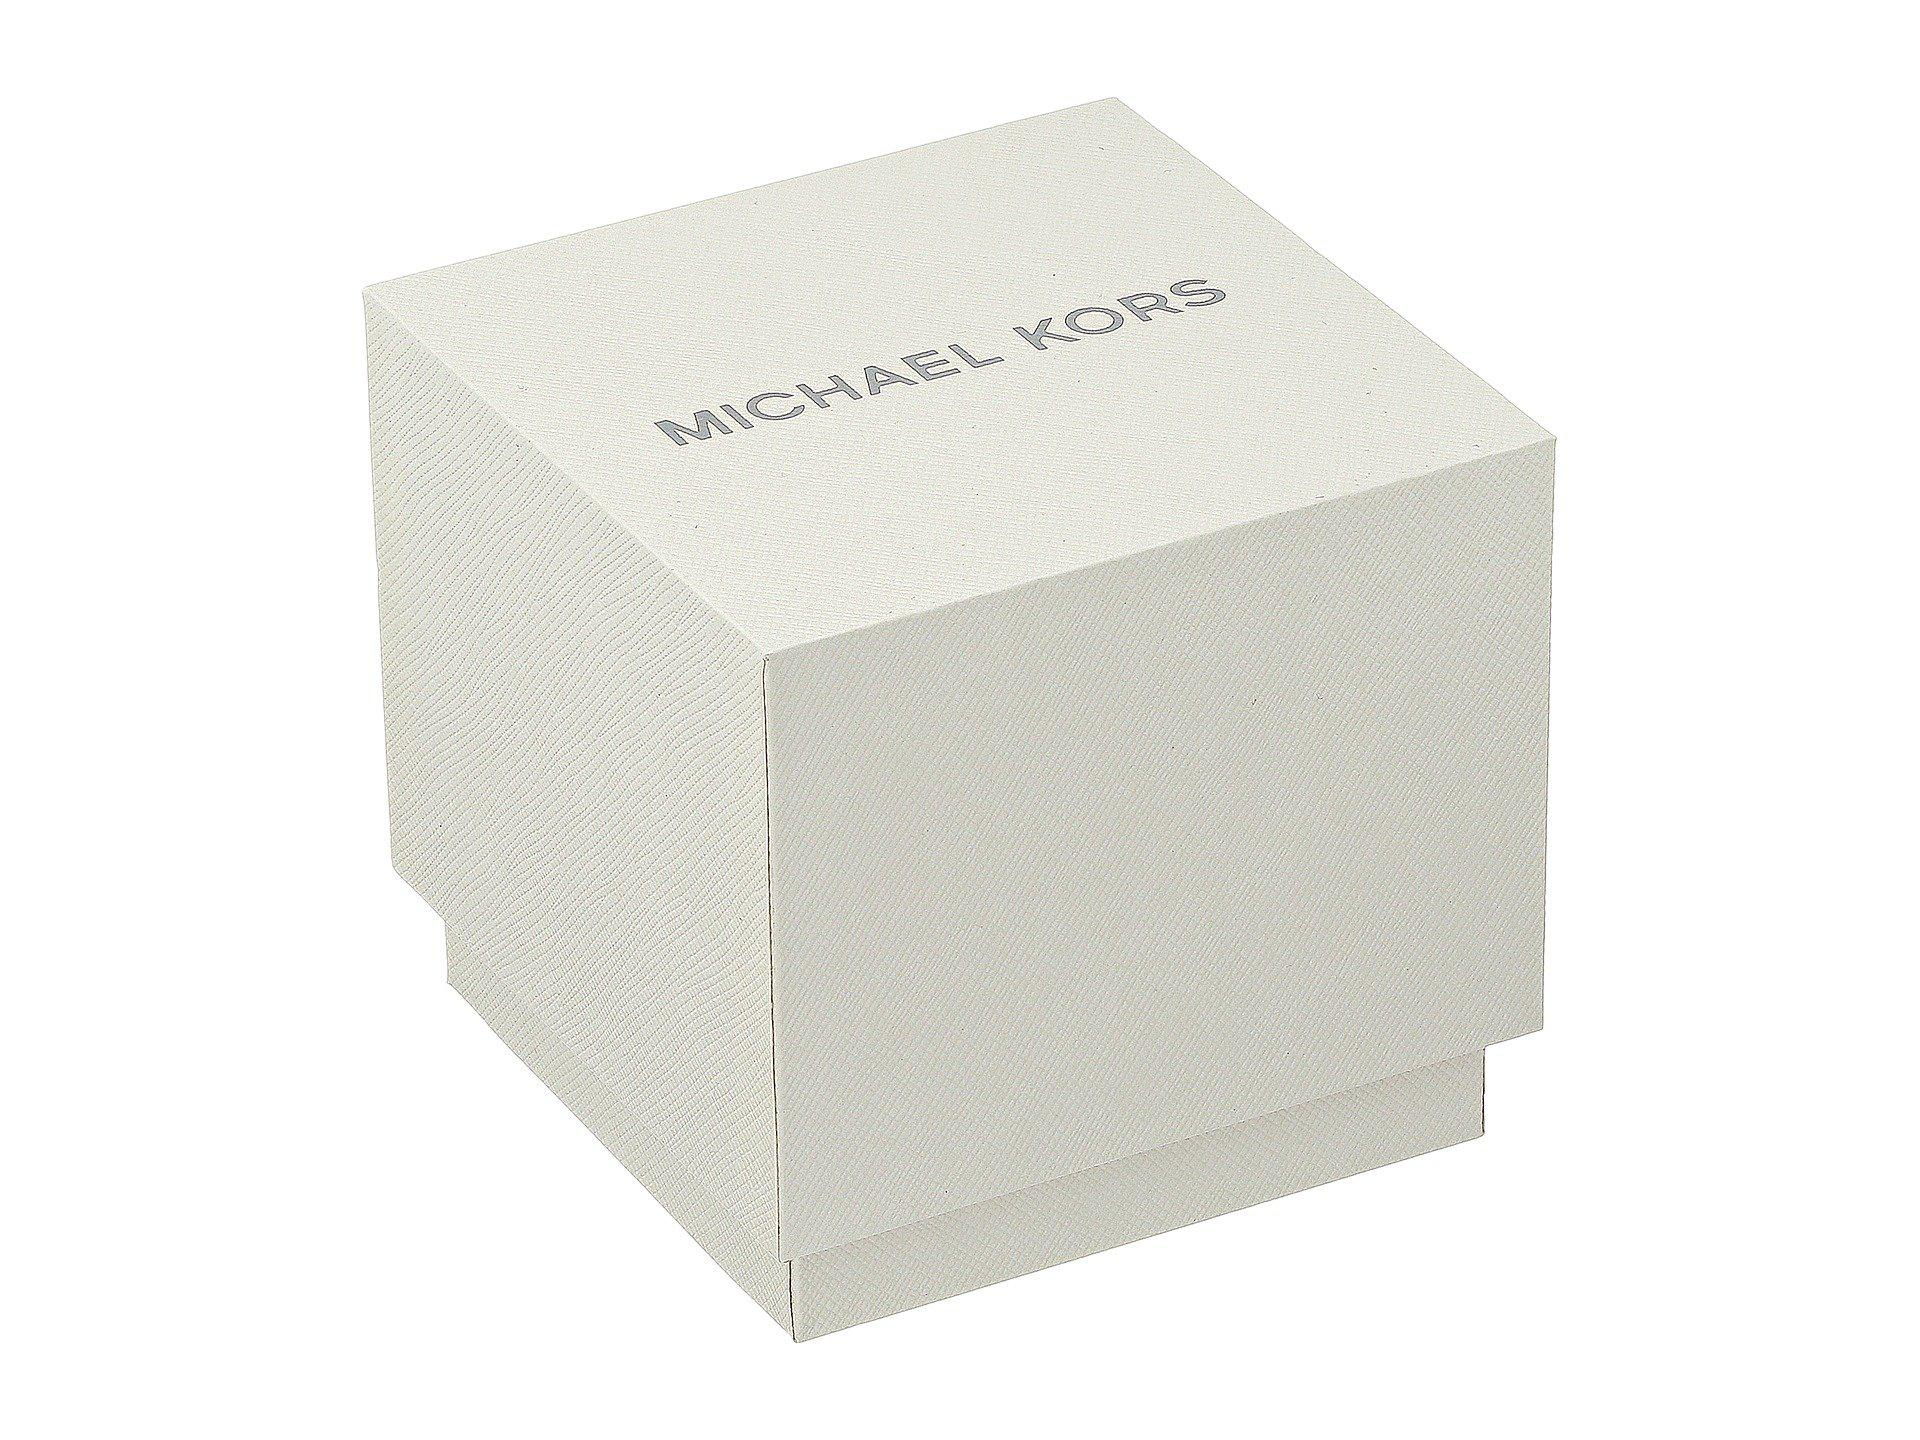 006e49dae31b Lyst - Michael Kors Mk6557 - Bradshaw in Metallic for Men